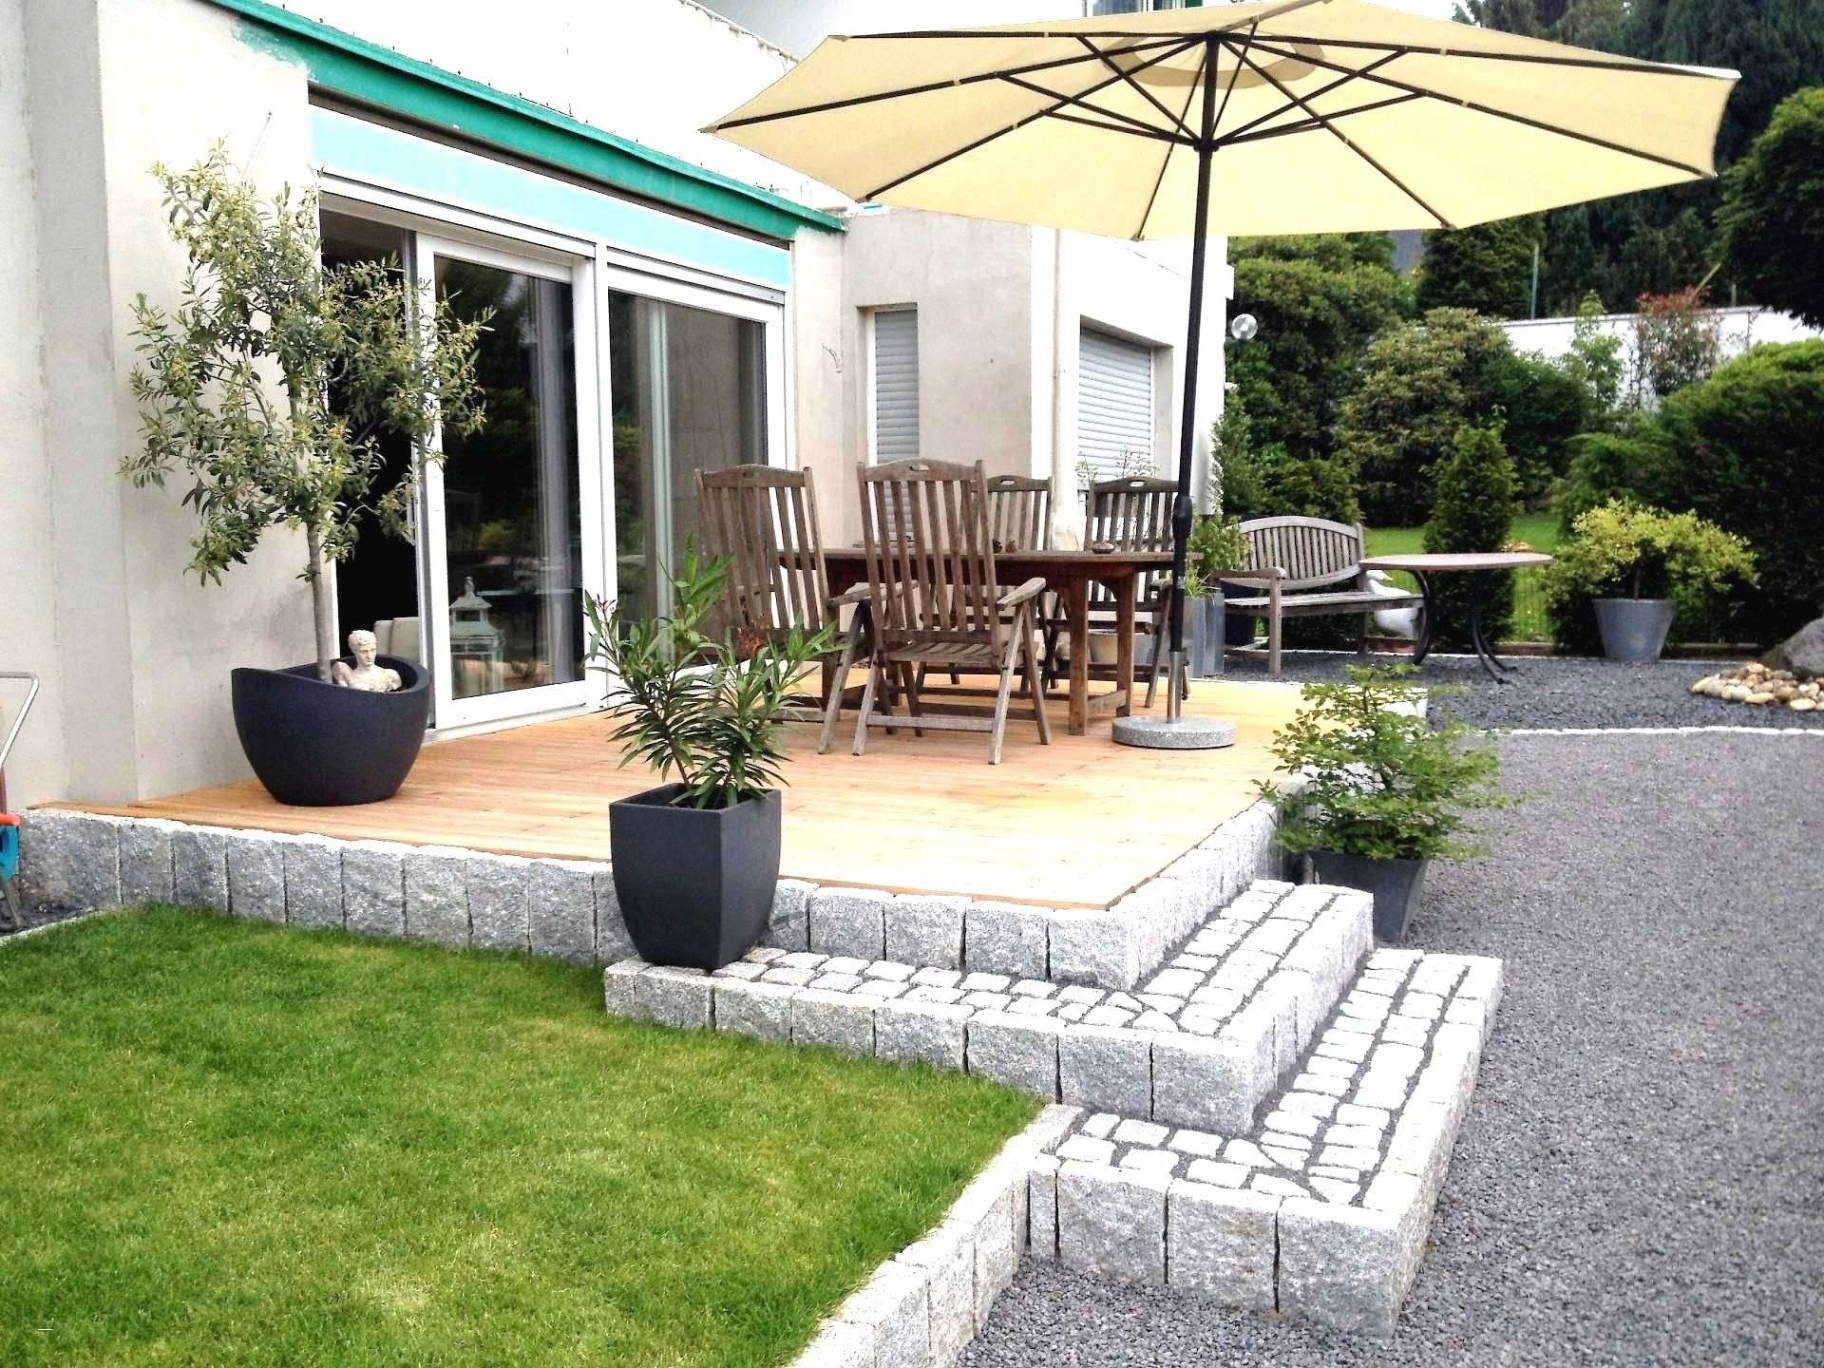 Bastelideen Garten Luxus Garten Ideen Selber Machen — Temobardz Home Blog